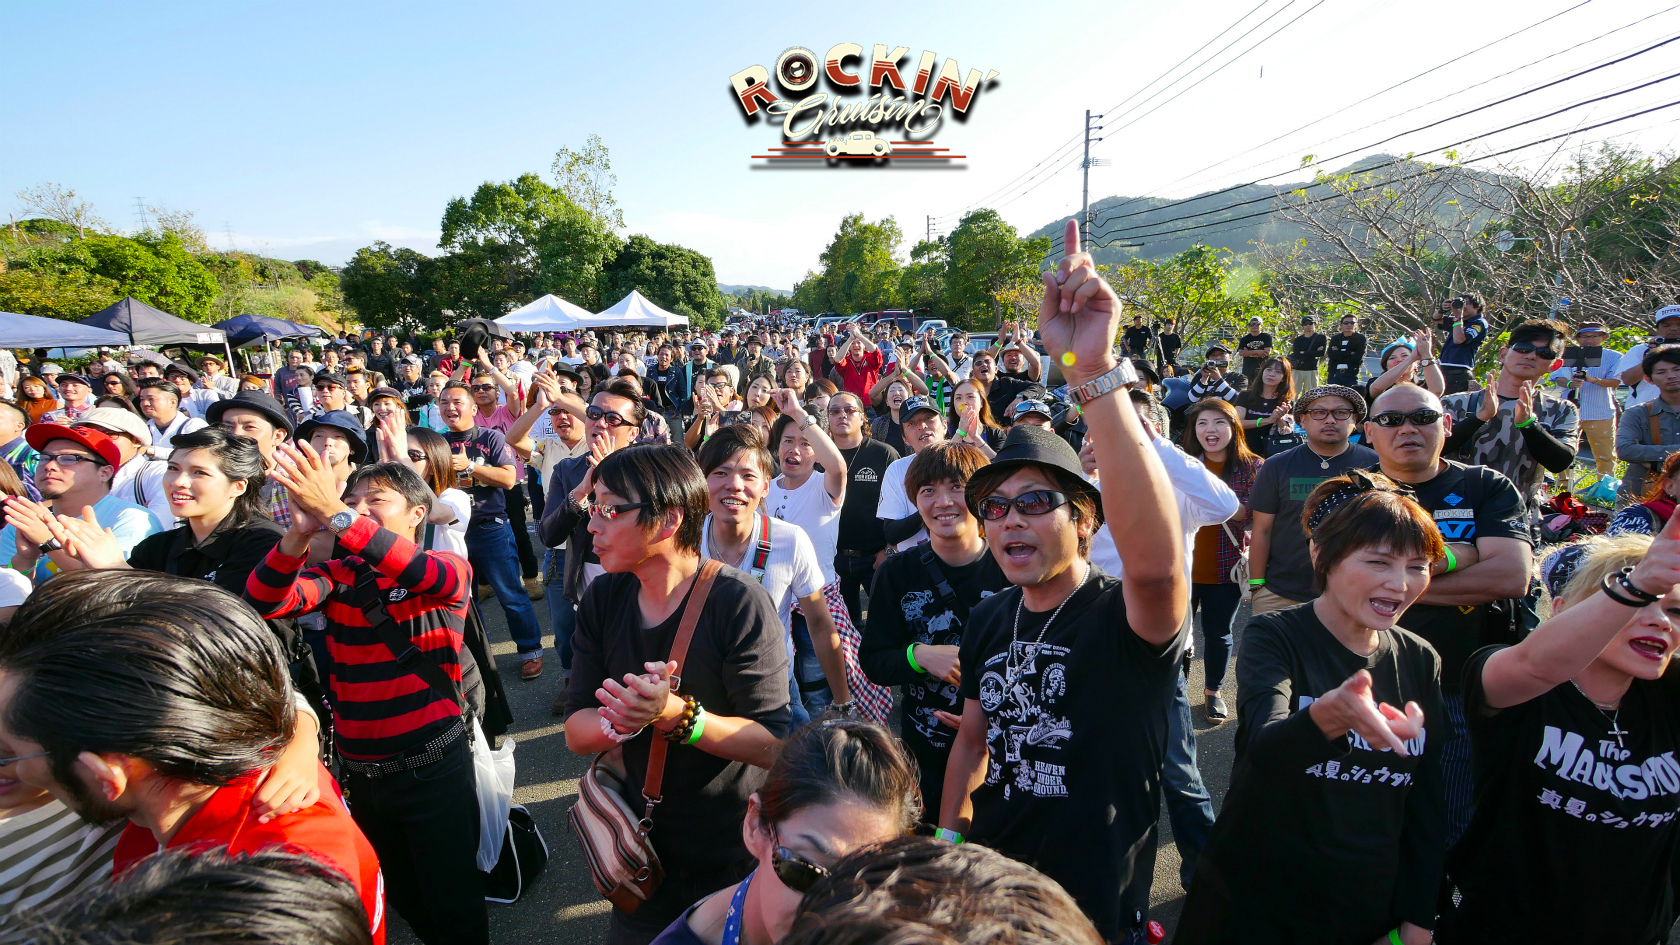 58-3-rockin11th_0735